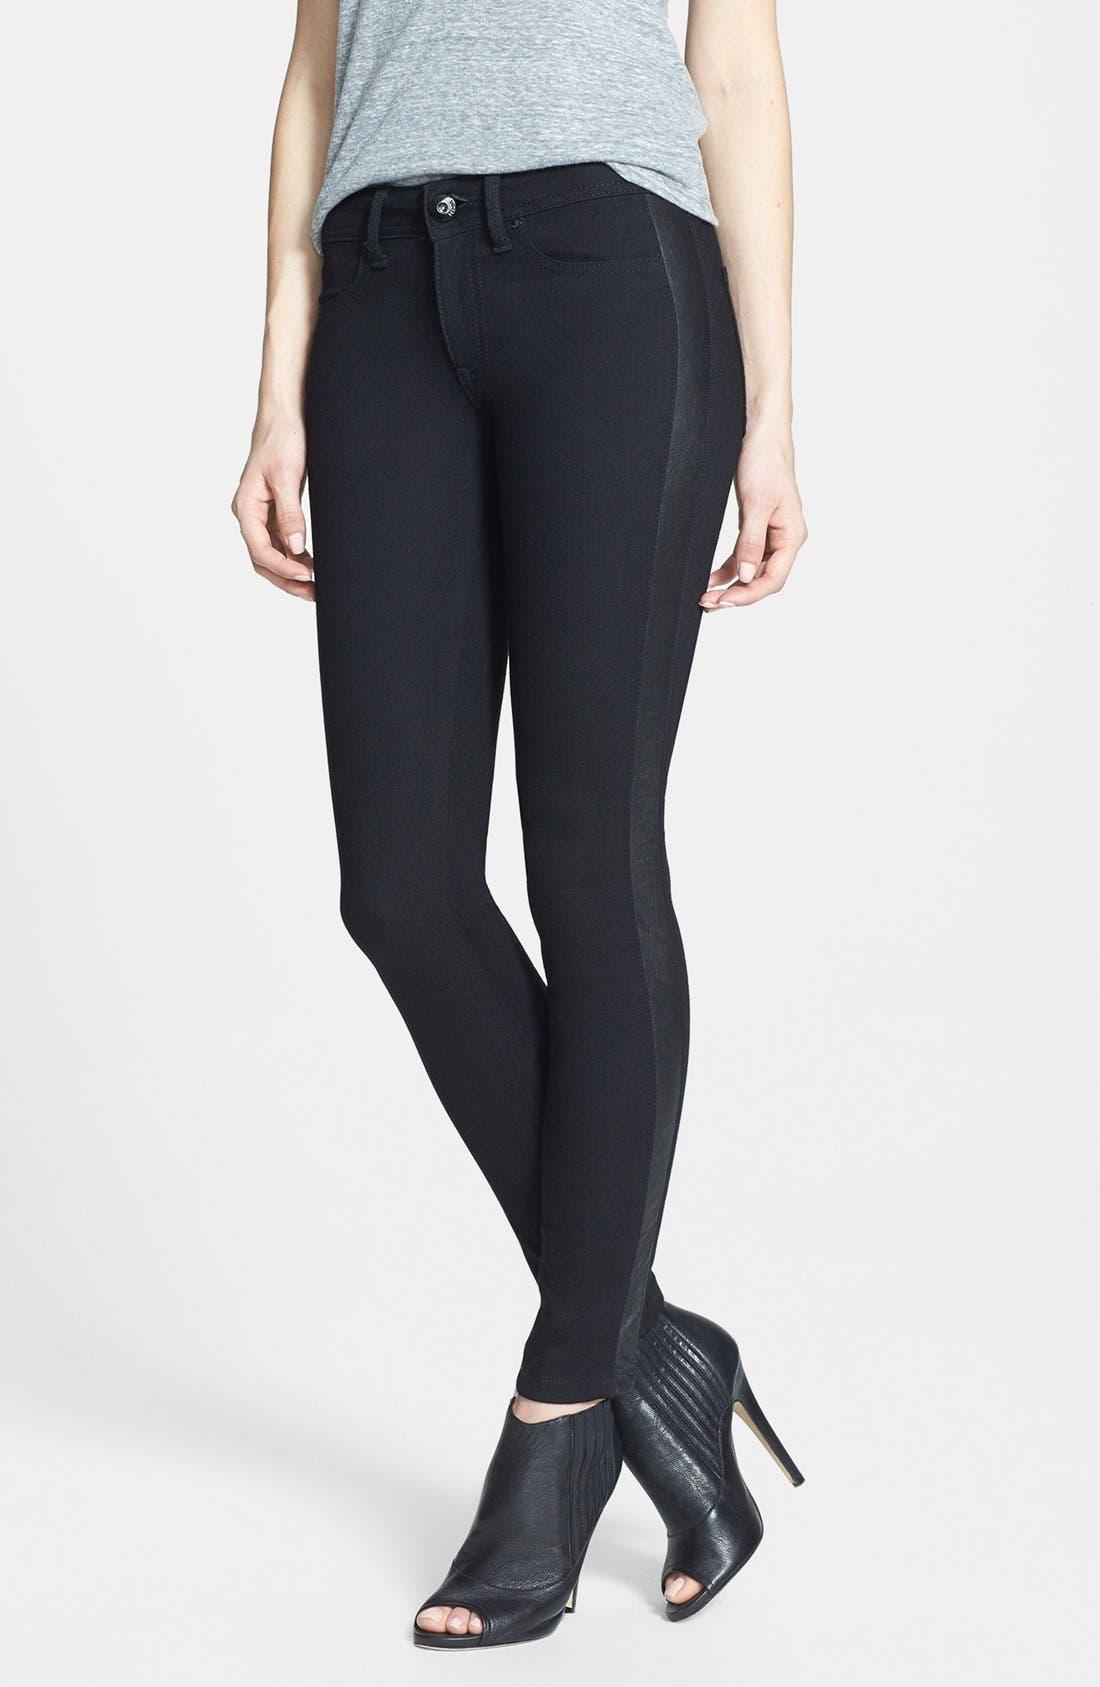 Alternate Image 1 Selected - DL1961 'Emma' Leather Tuxedo Stripe Skinny Jeans (Ravenna)